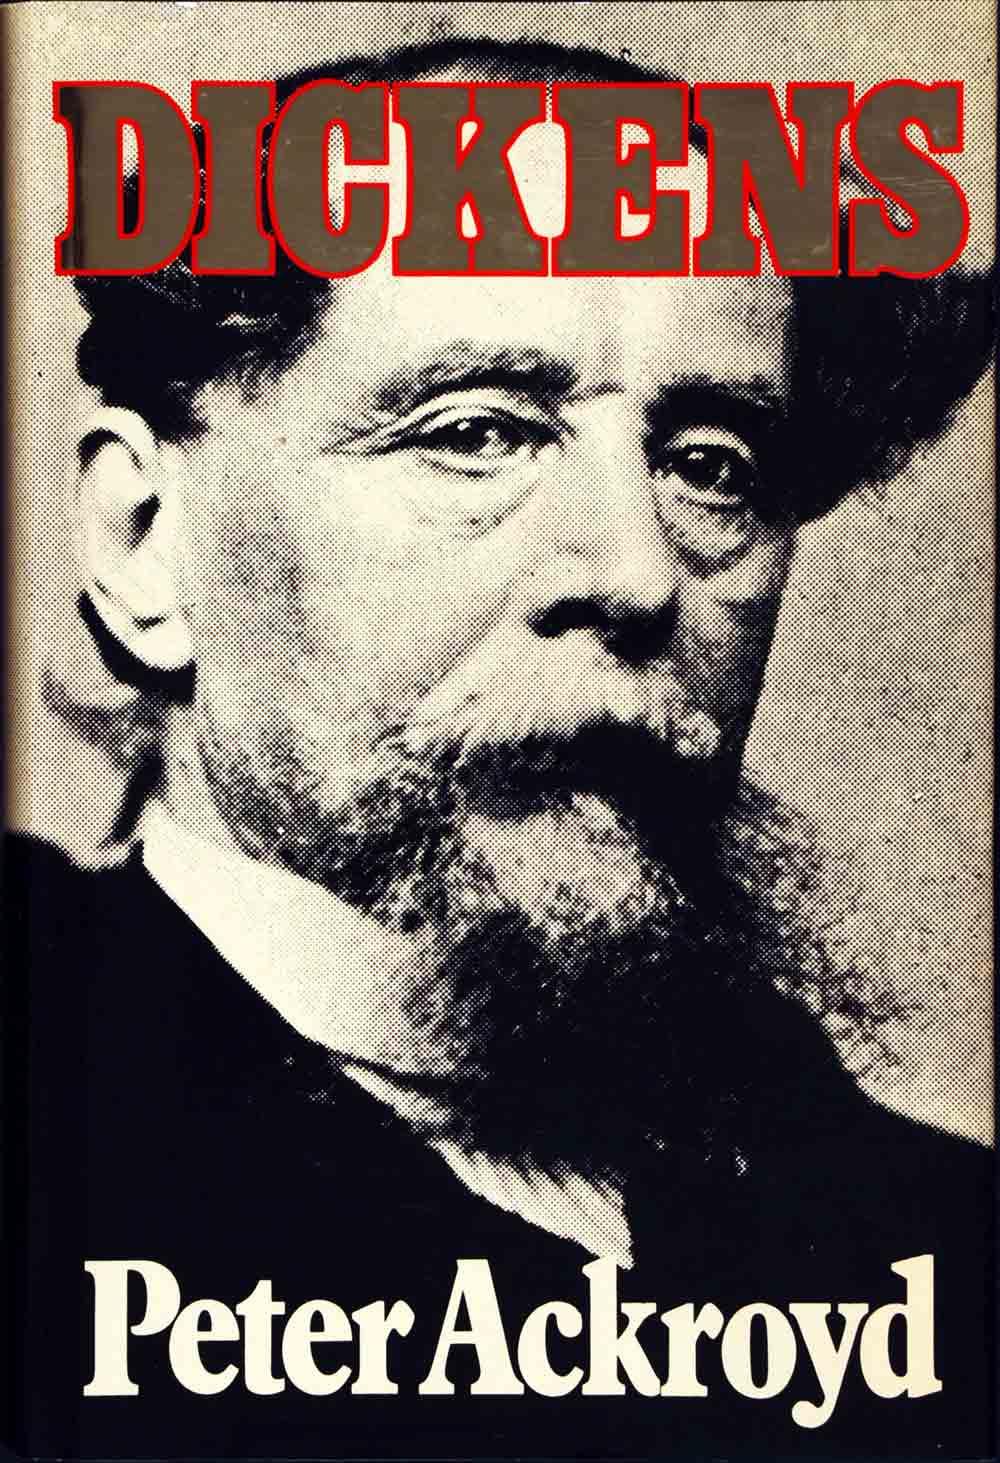 Peter Ackroyd. Dickens. London: Sinclair-Stevenson, 1990